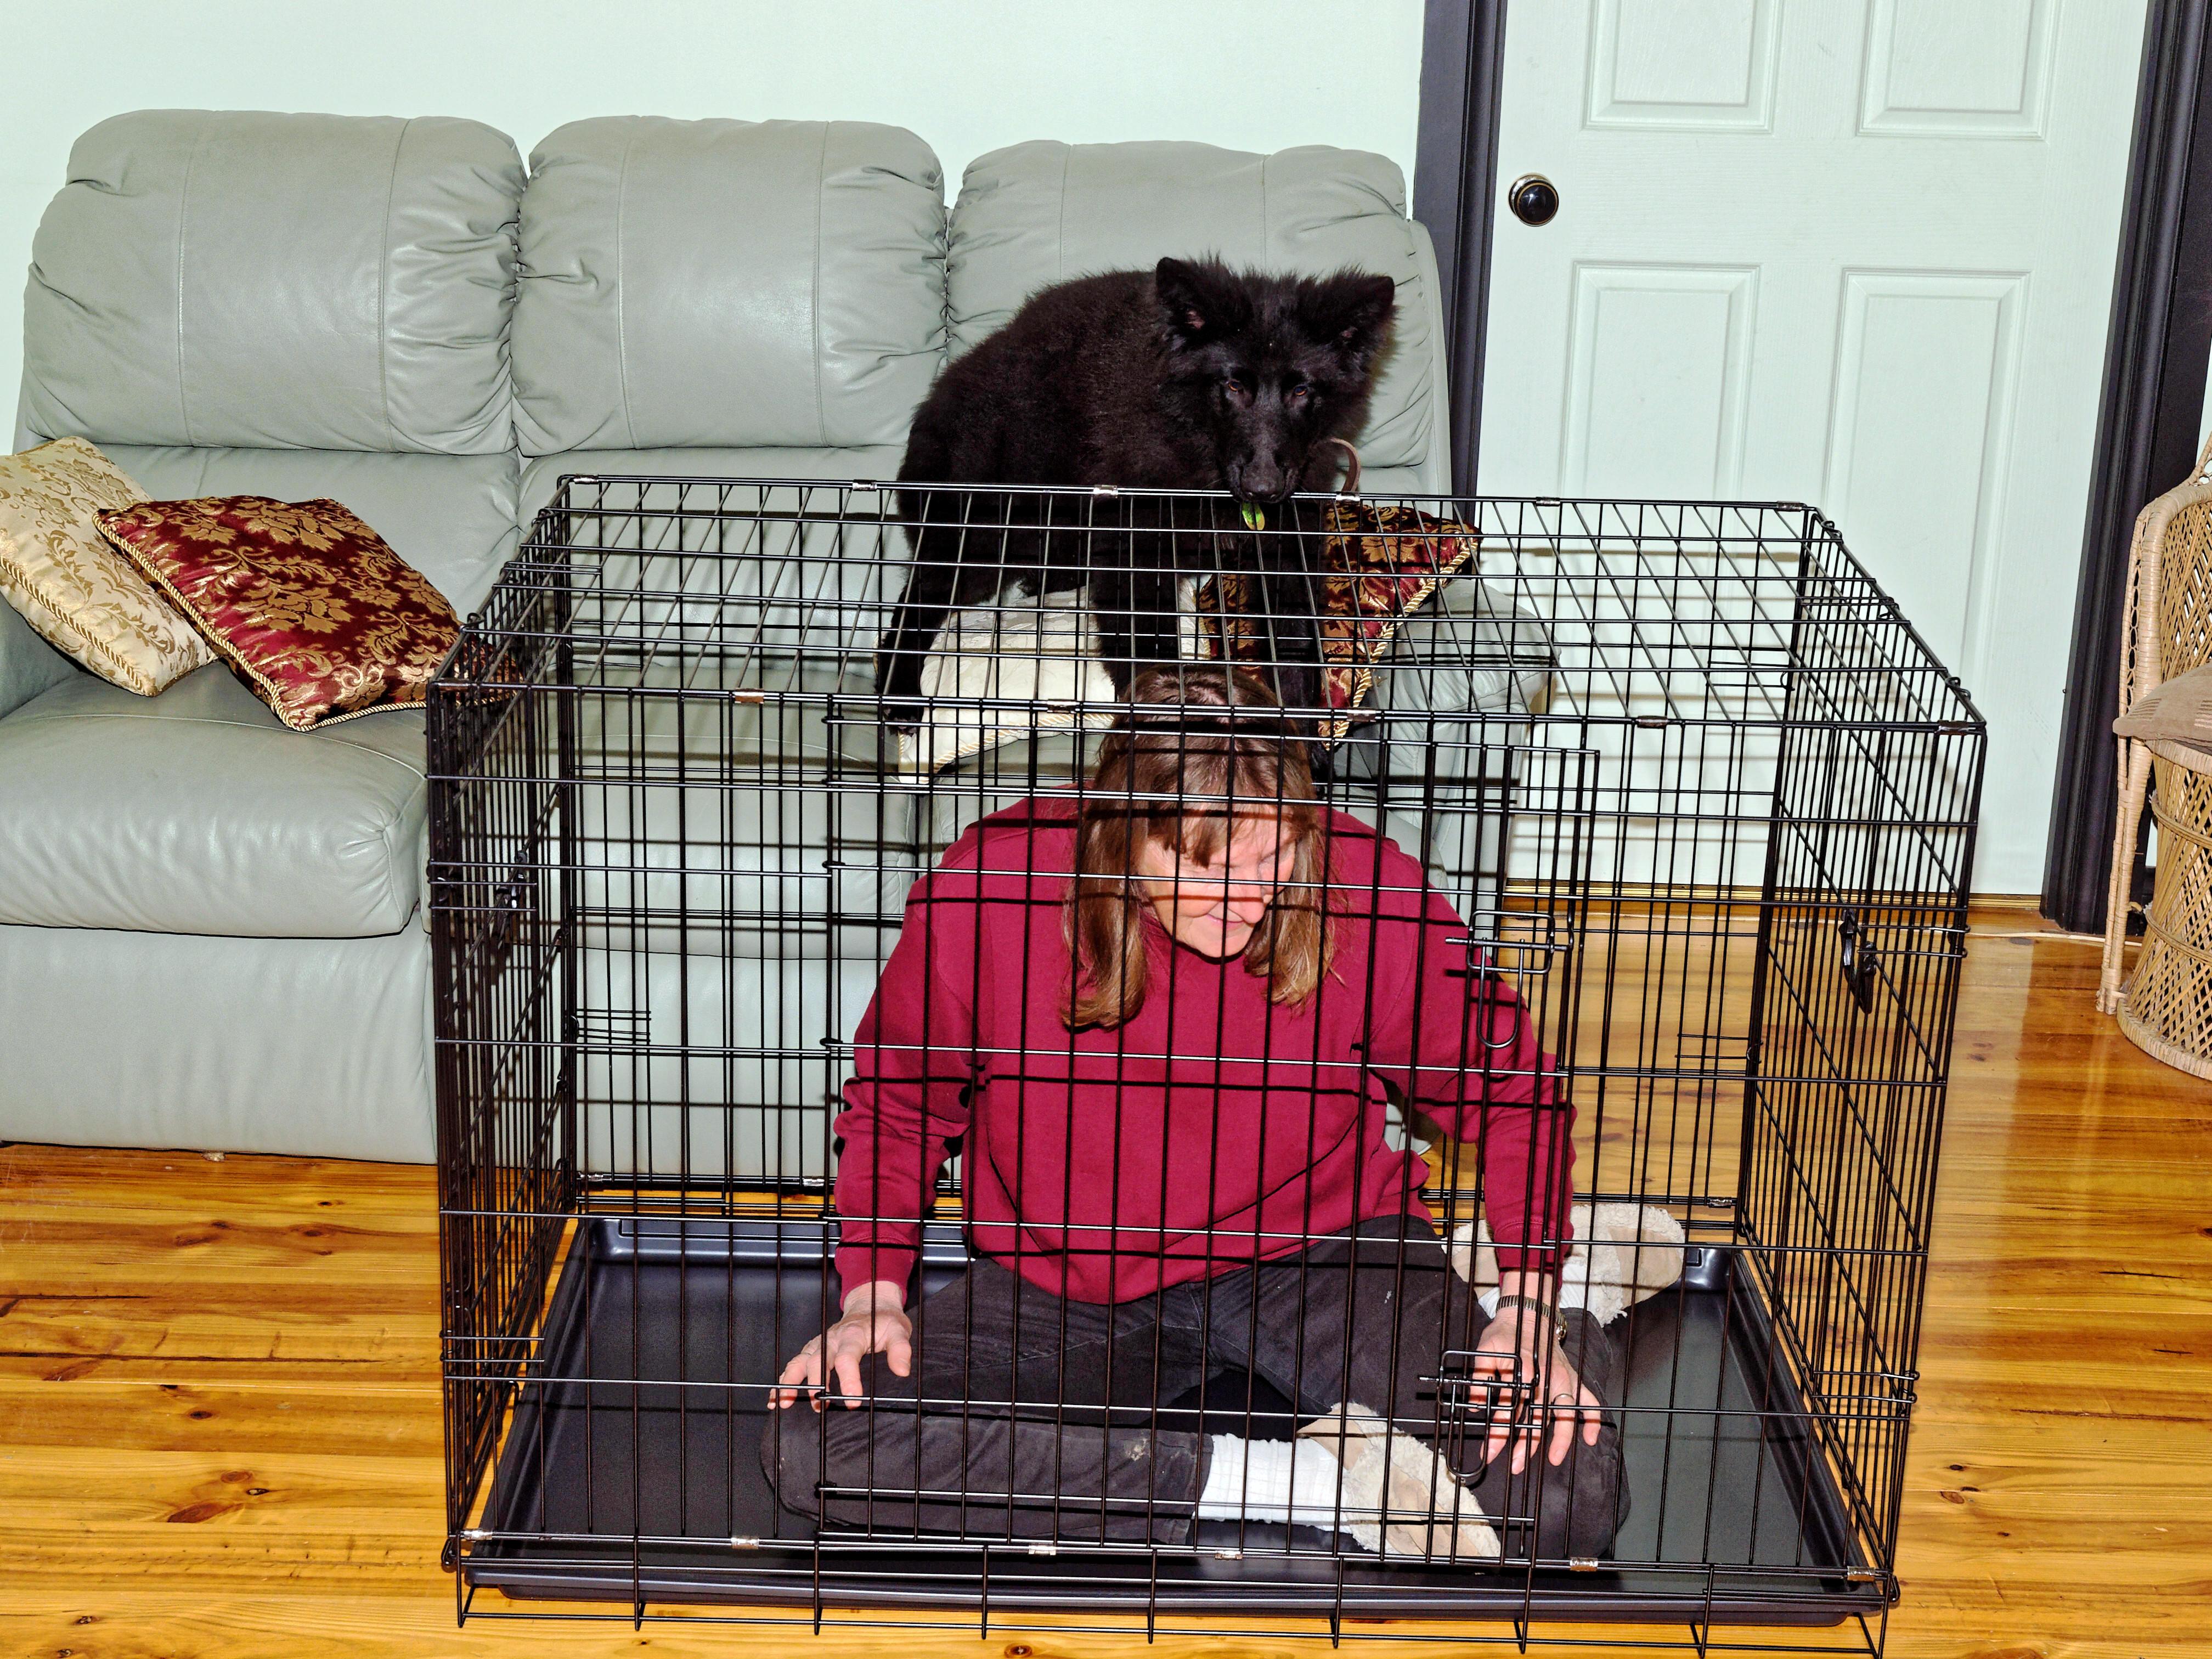 Cage-2.jpeg